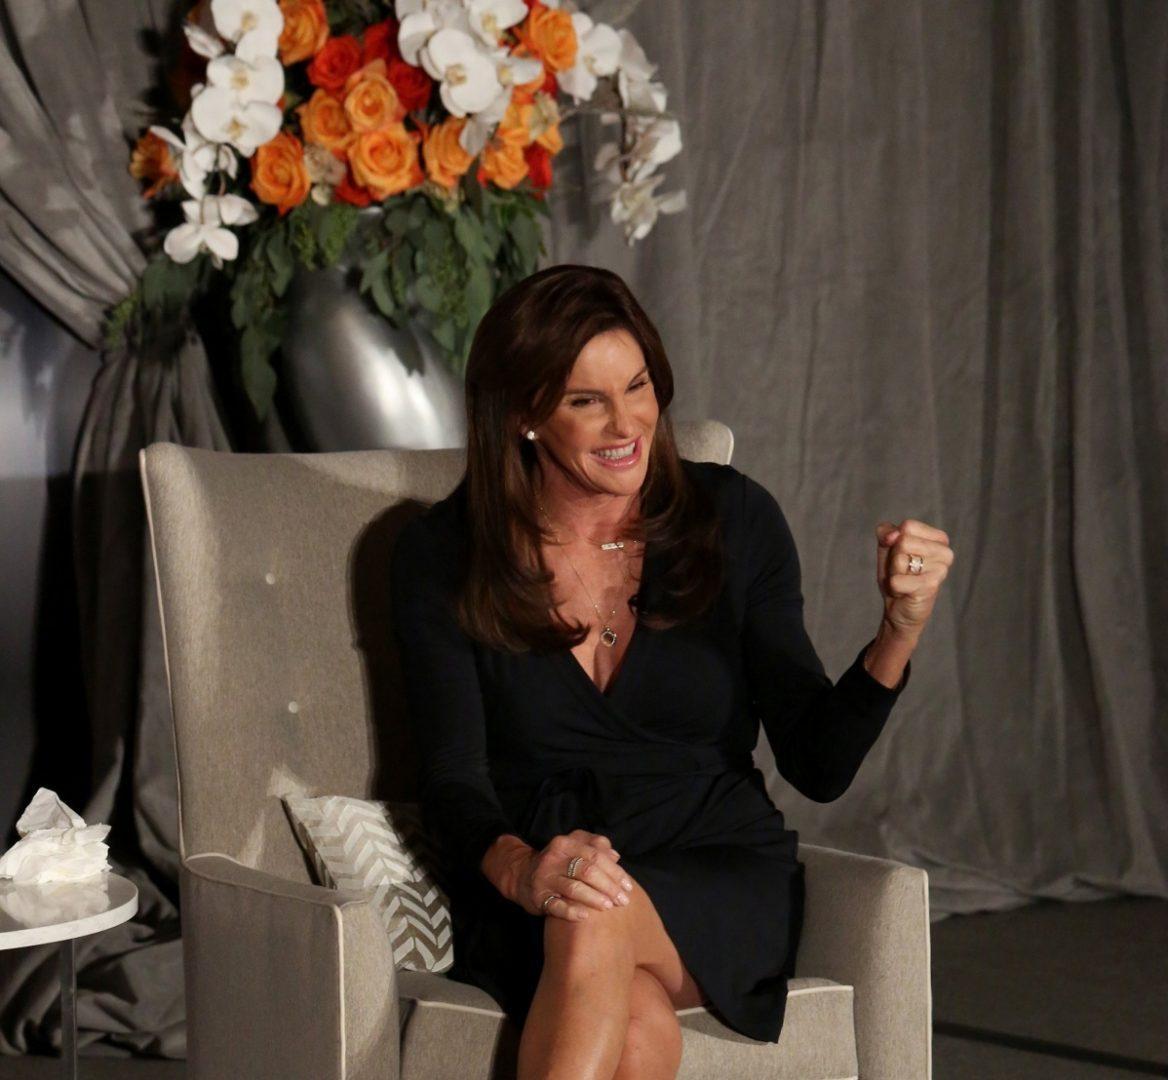 Caitlyn Jenner speaks to the Chicago House luncheon at the Hilton Chicago on Thursday, Nov. 12, 2015. (Nancy Stone/Chicago Tribune/TNS)